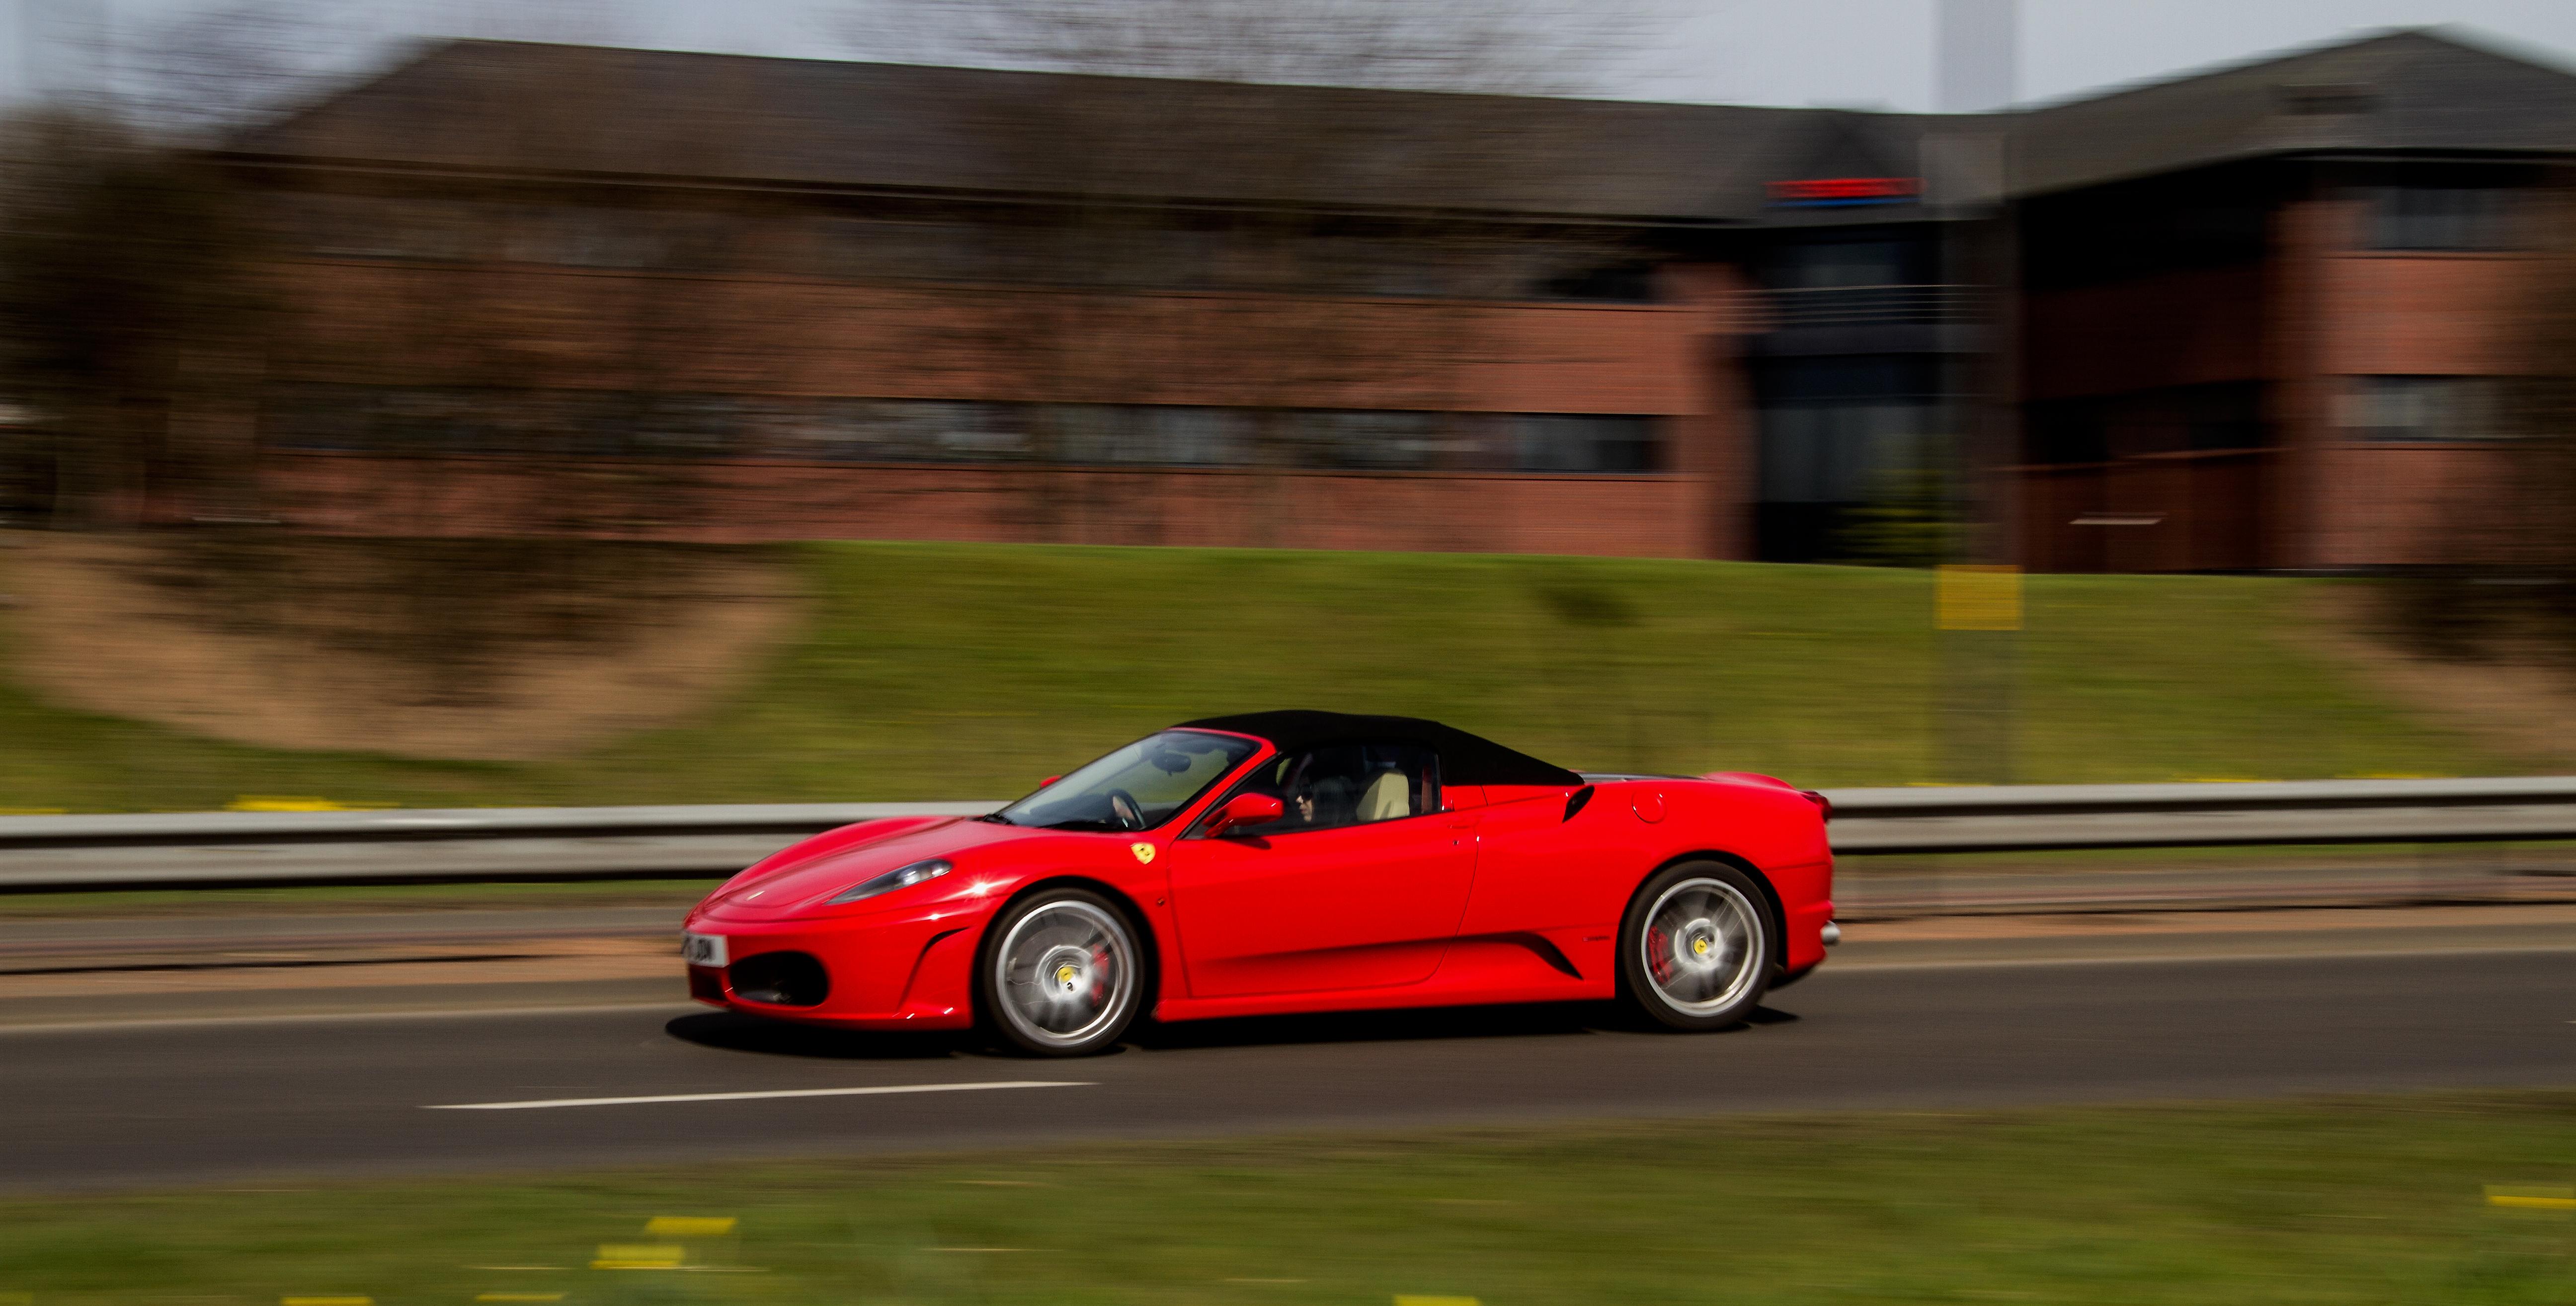 Ferrari Convertible by DundeePhotographics